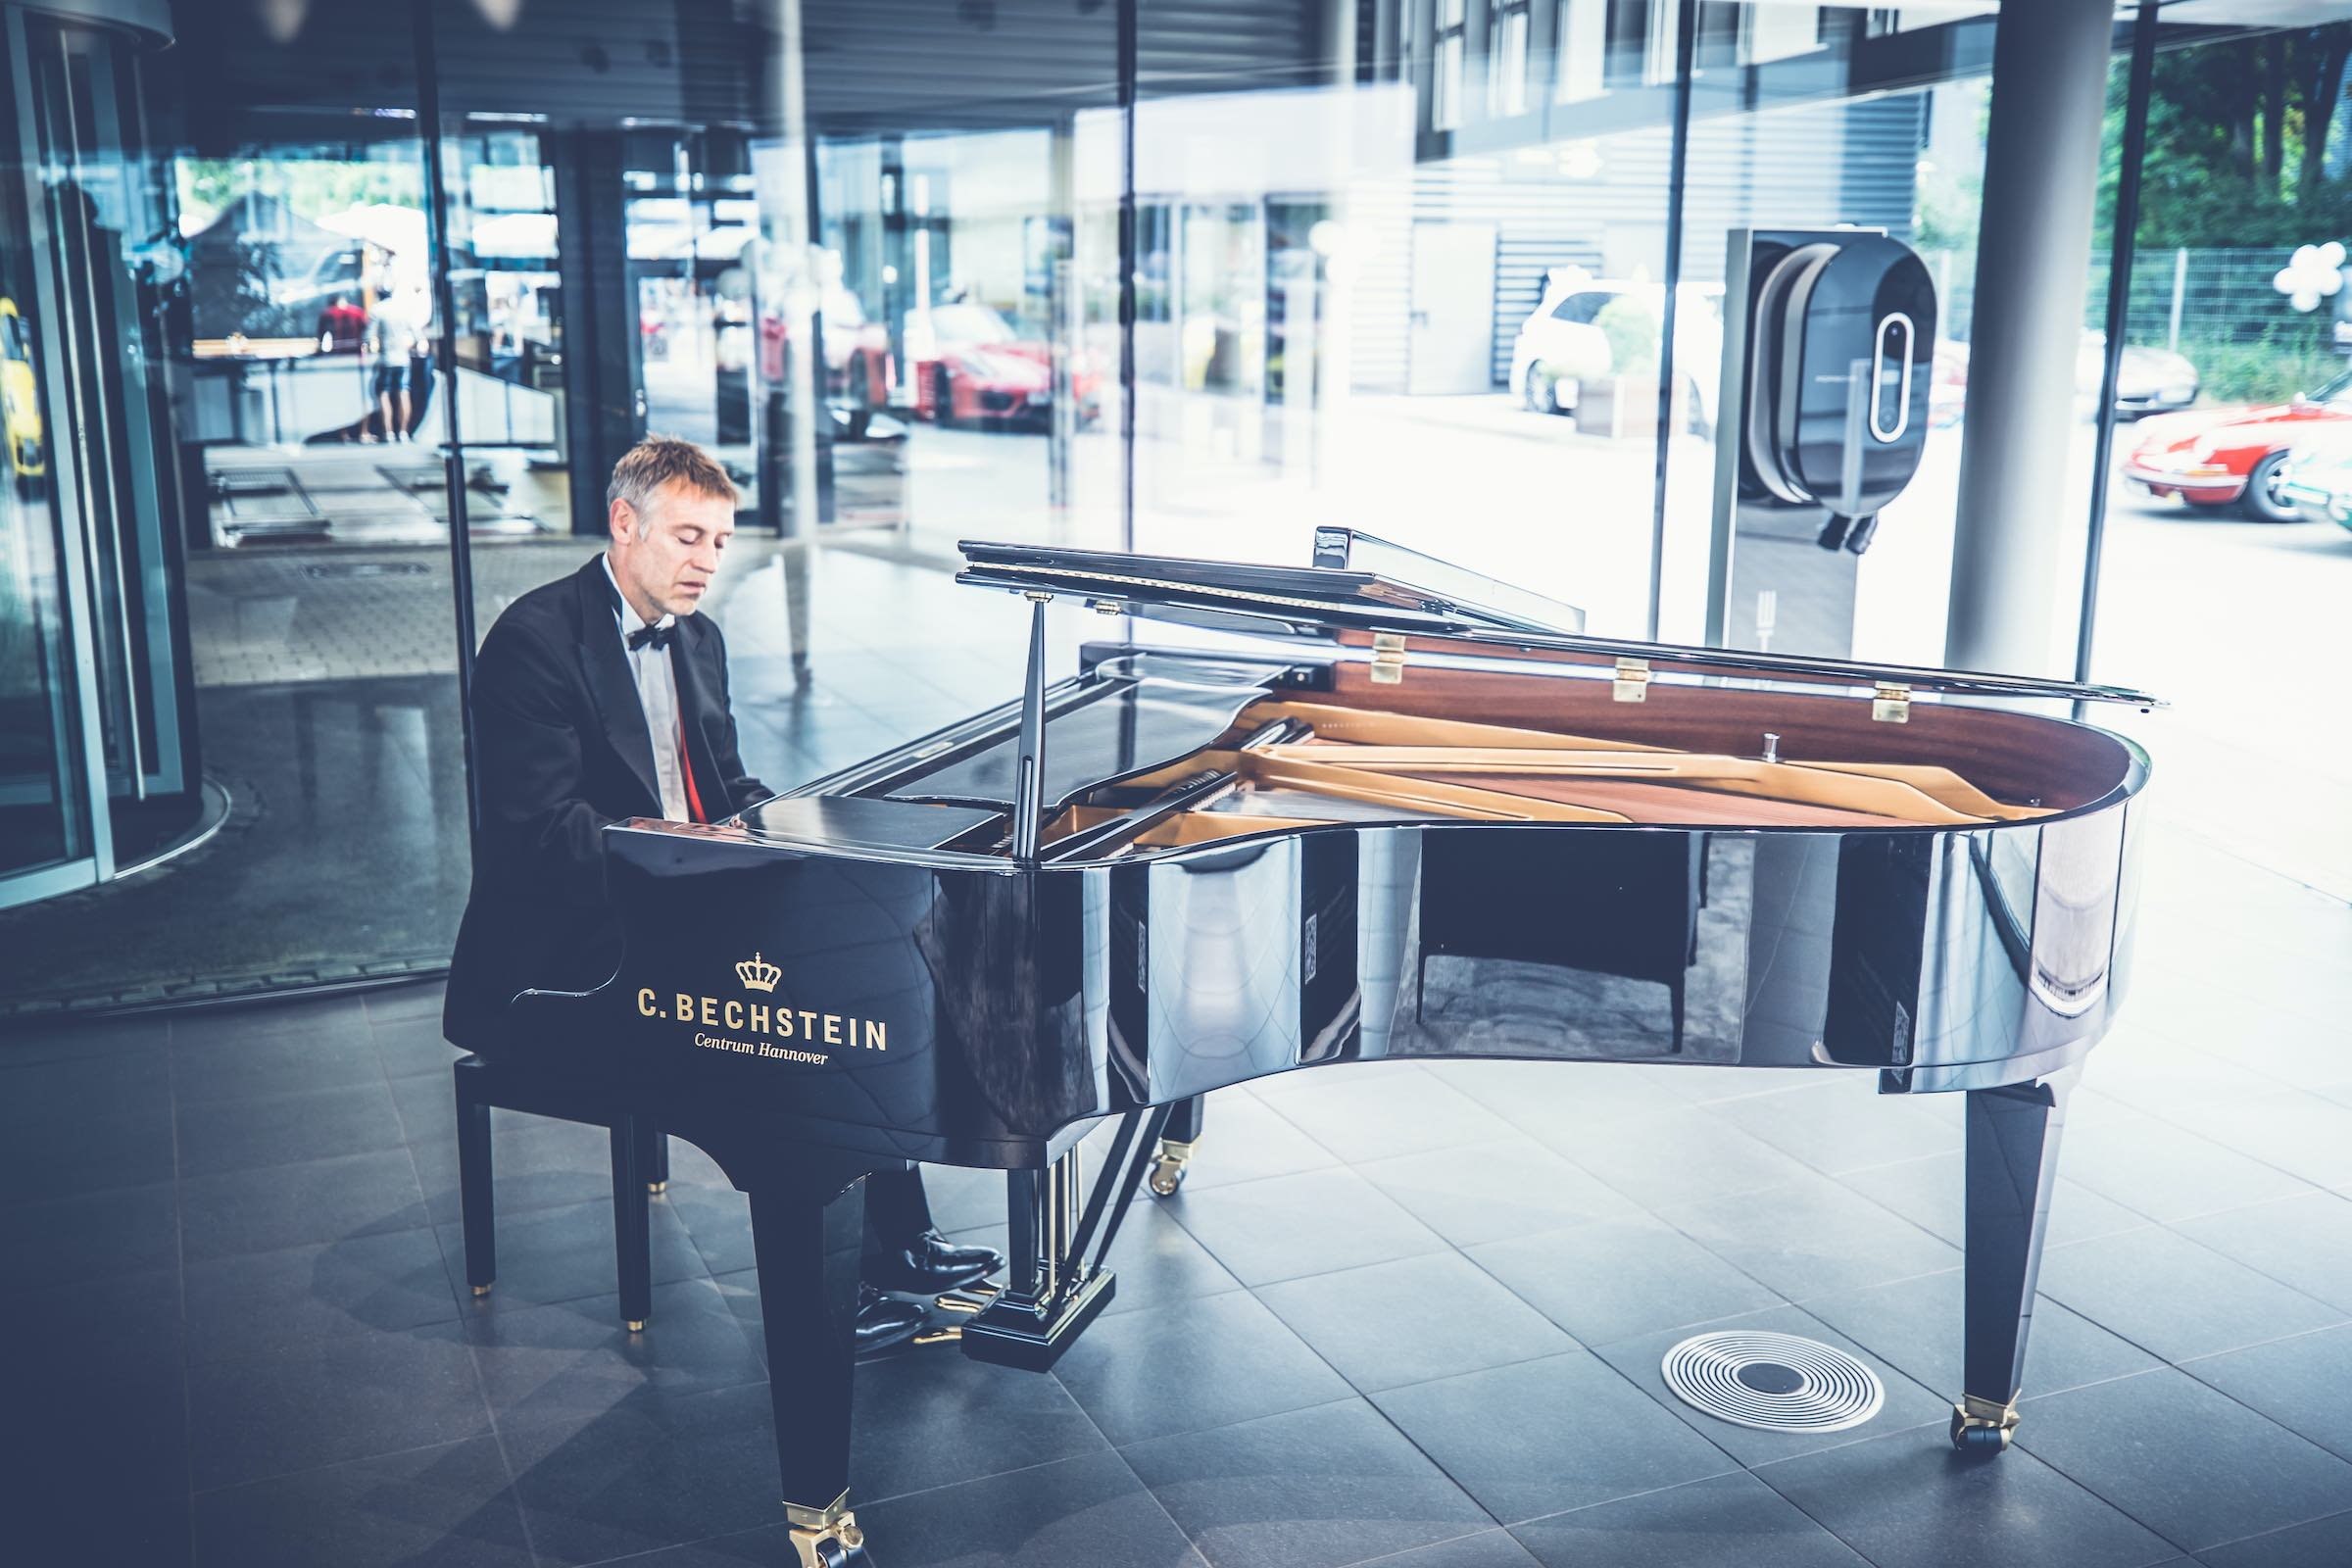 Pianist   Klavierspieler   Hannover   Flügel   Piano   Hochzeit   Buchen   Livemusik   Jazz   Swing   Pop   Motown   Soul   Klavier   Messe   Firmenfeier   Empfang   Buchen   Mieten   Anfragen   Lehmann   Eventservice